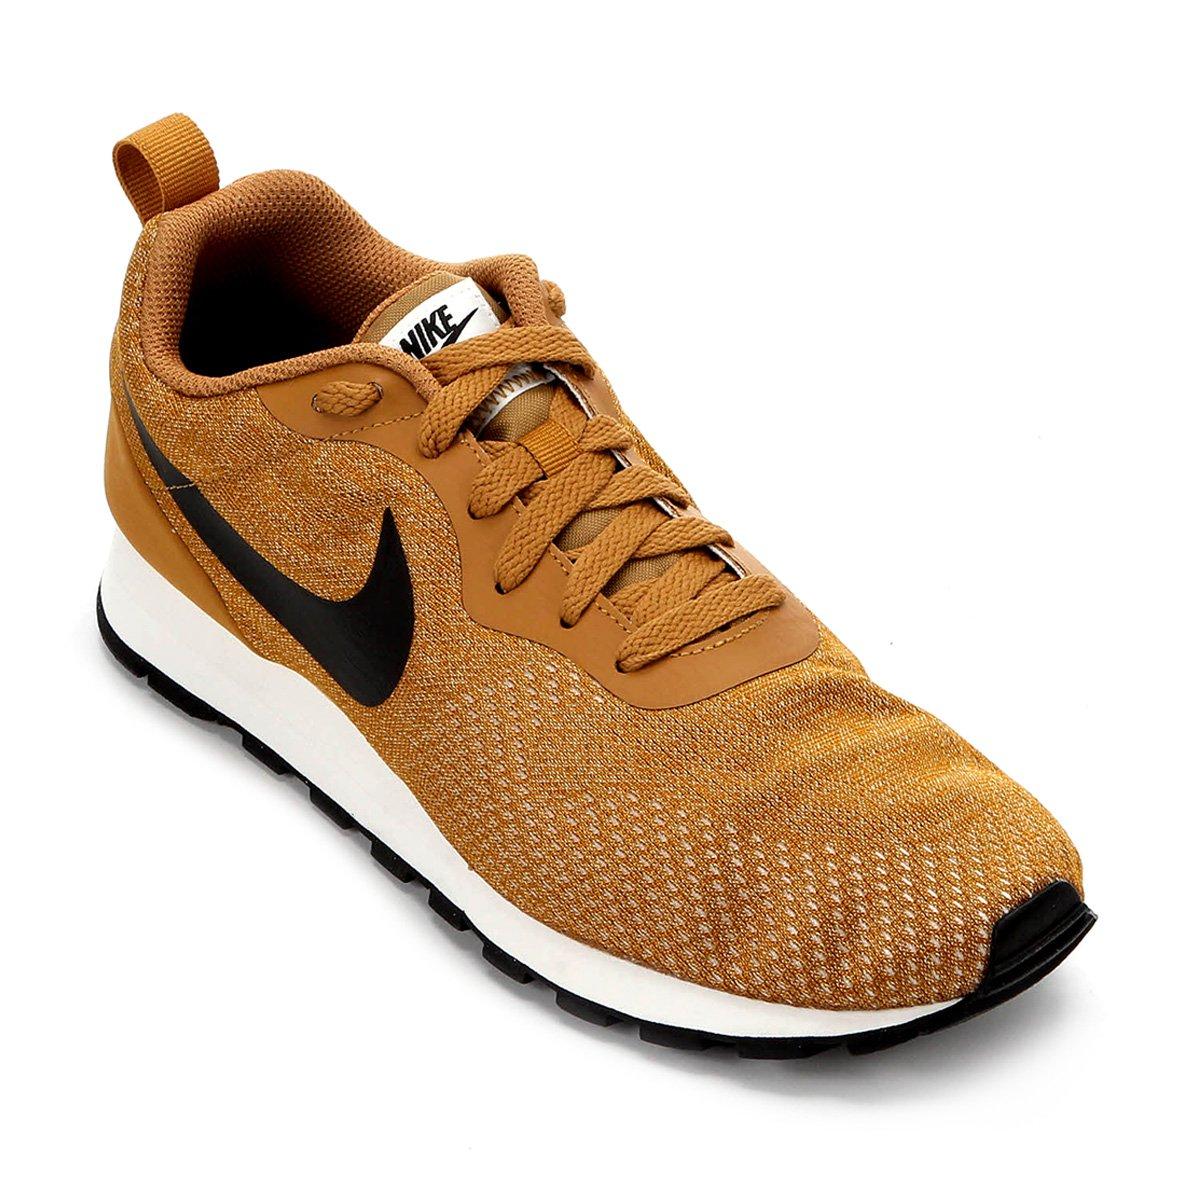 9ff40d170a Tênis Nike Md Runner 2 Eng Mesh Masculino - Caramelo e Preto ...